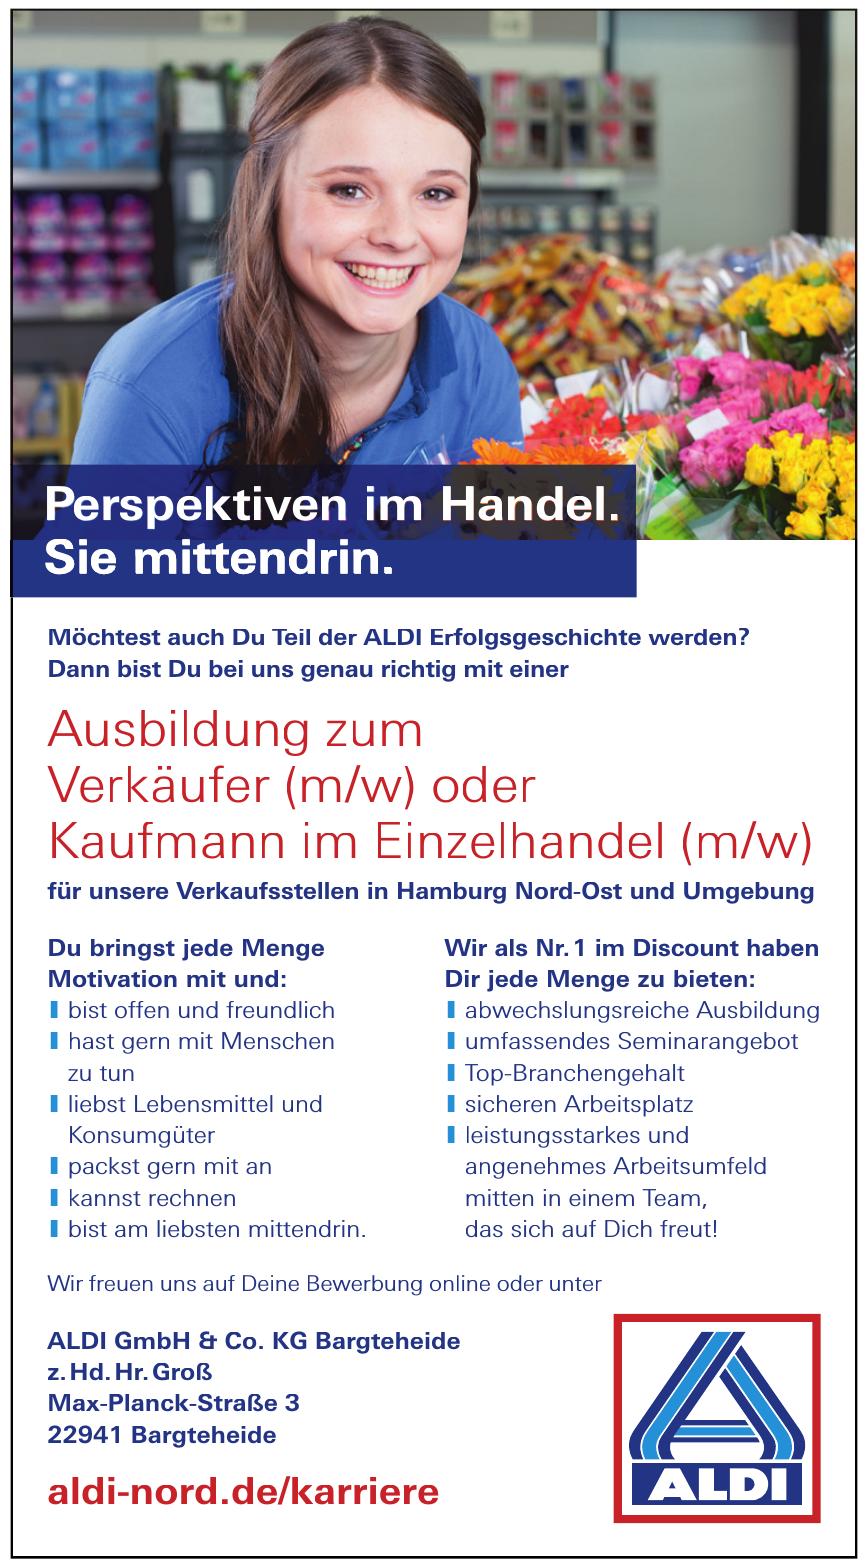 ALDI GmbH & Co. KG Bargteheide